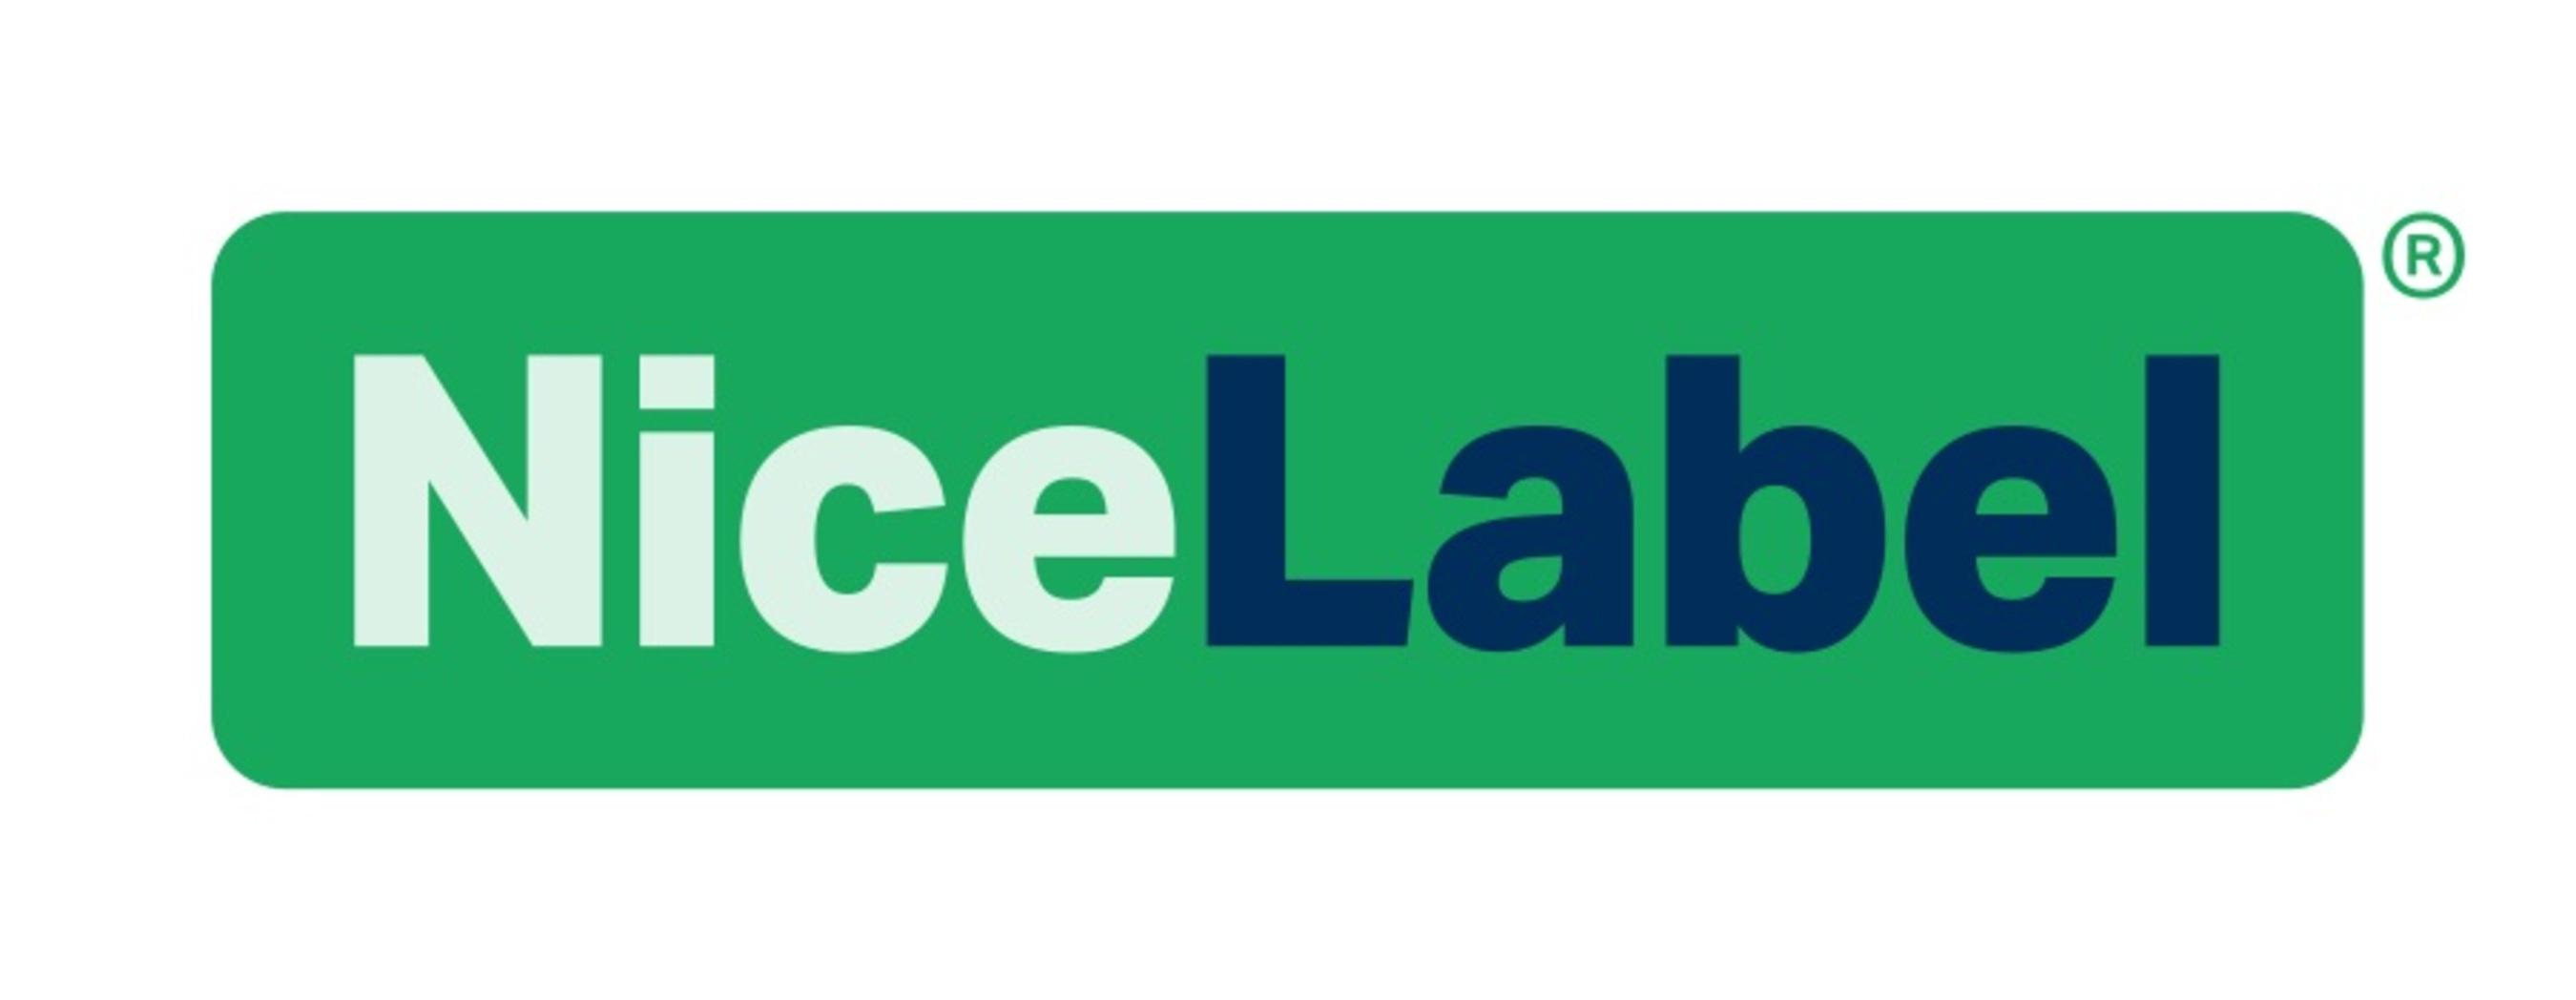 NiceLabel logo.